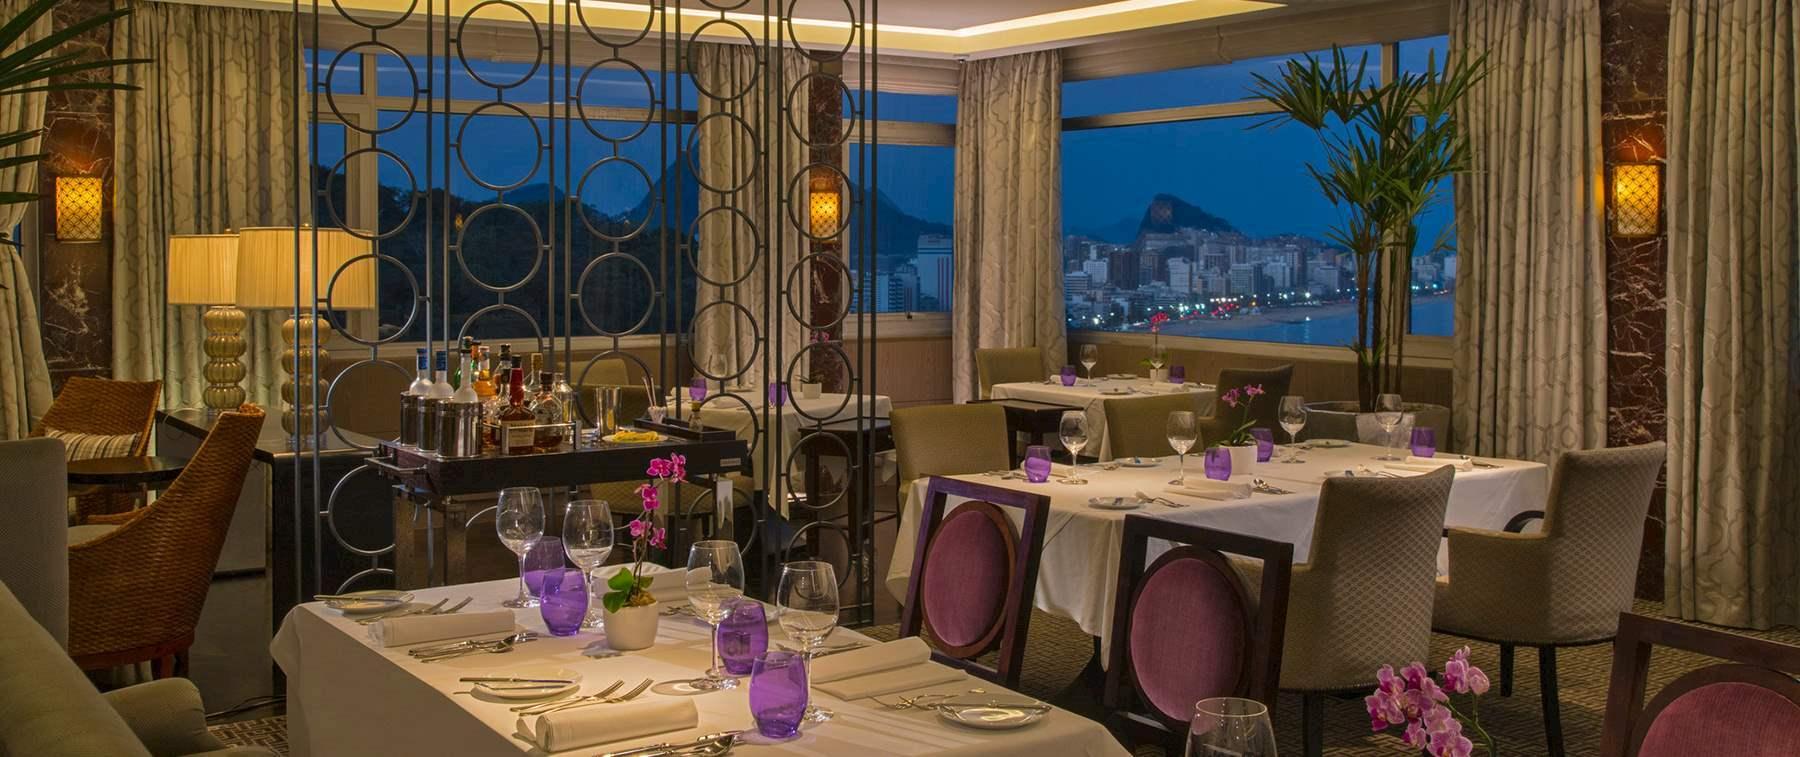 Image result for l'etoile restaurant rio